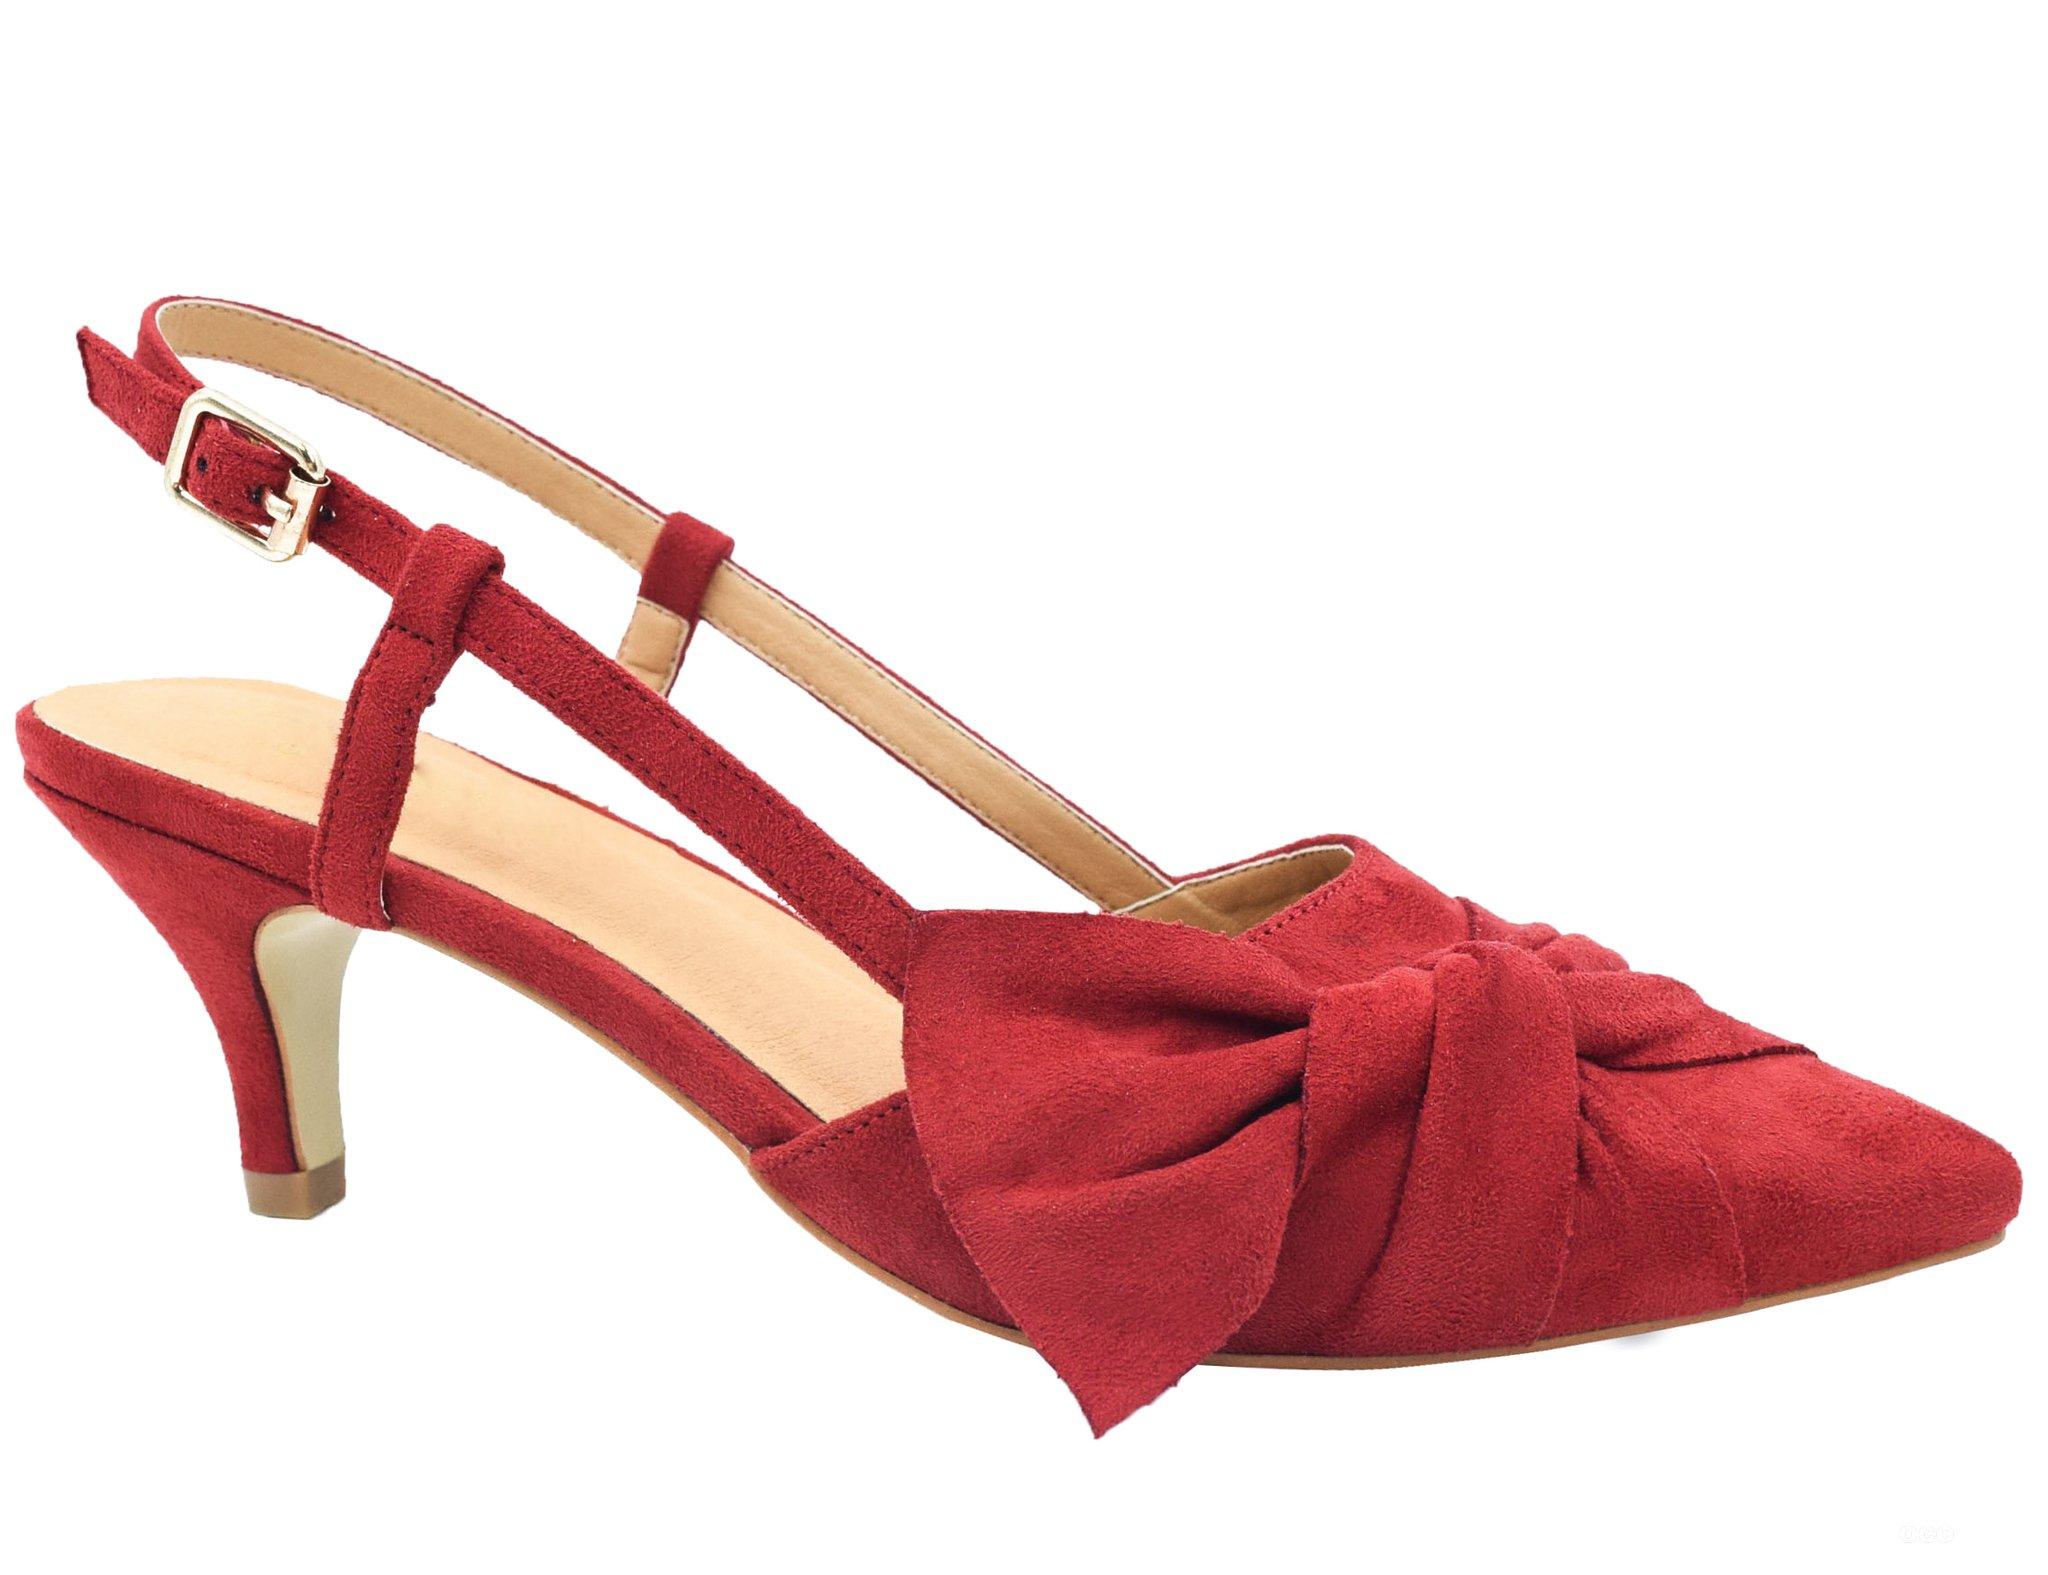 Greatonu Women Shoes Red Sexy Closed Toe Kitten Heels Comfortable Slingback Dress Pumps Size 8